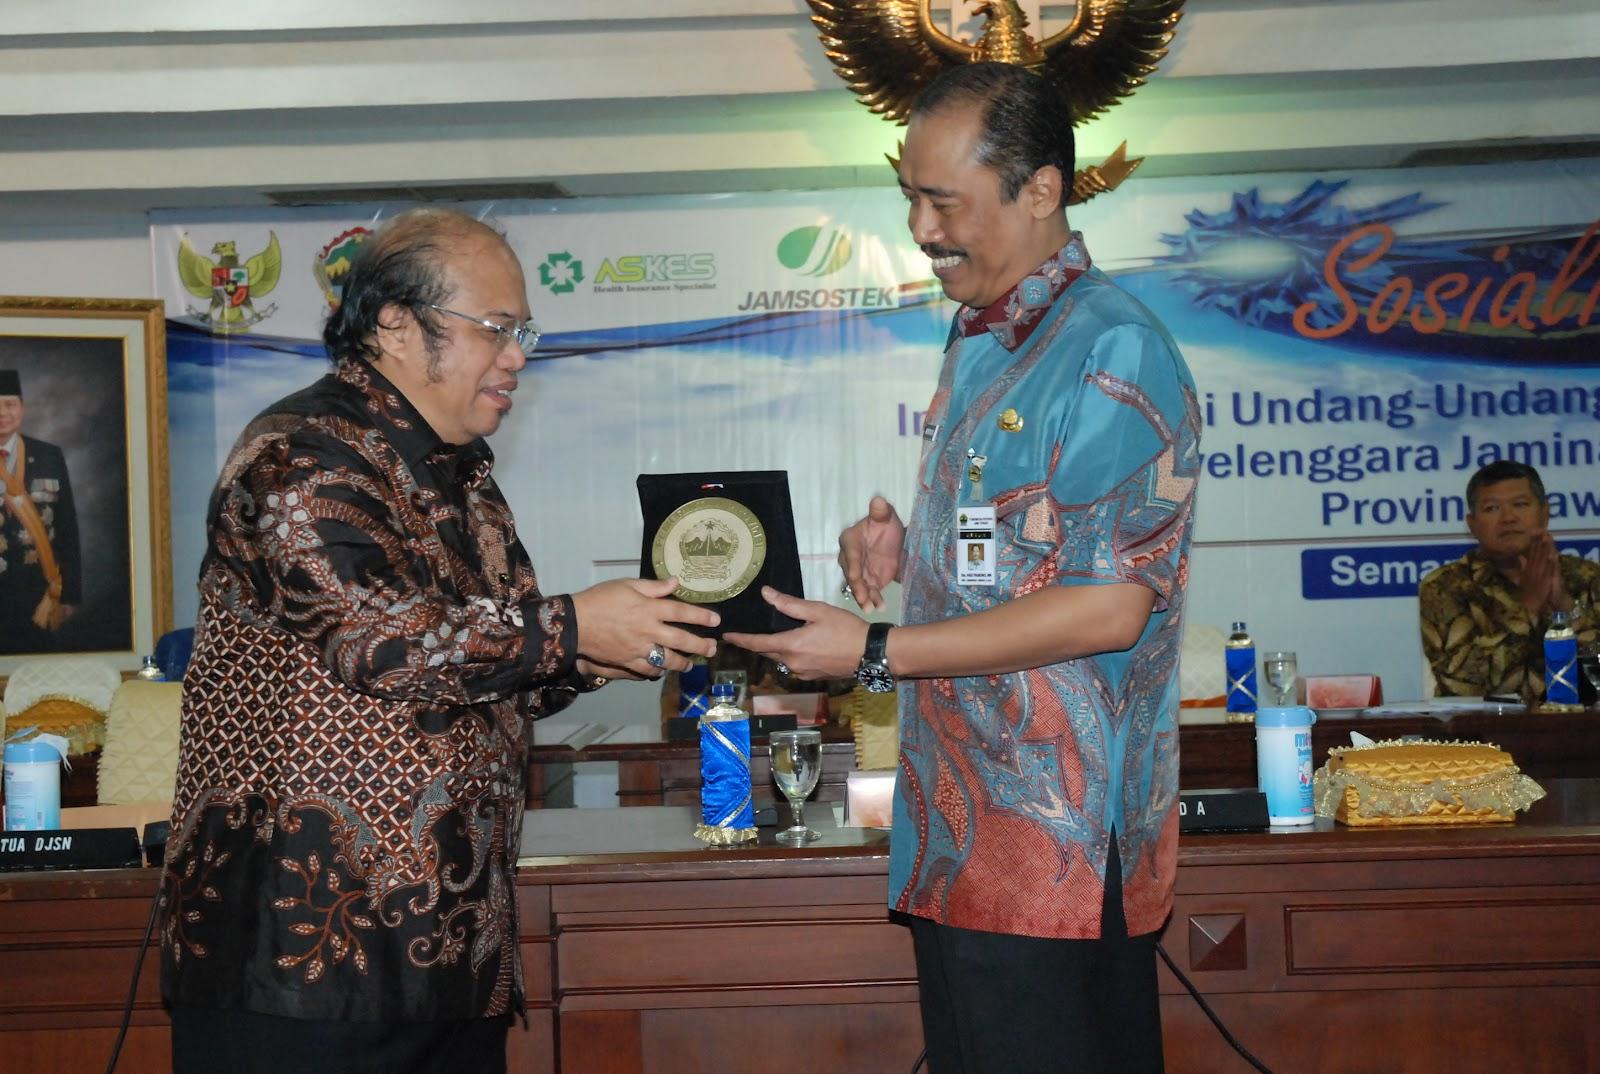 KENANG-KENANGAN: Sekda Hadi Prabowo menyerahkan kenang-kenangan